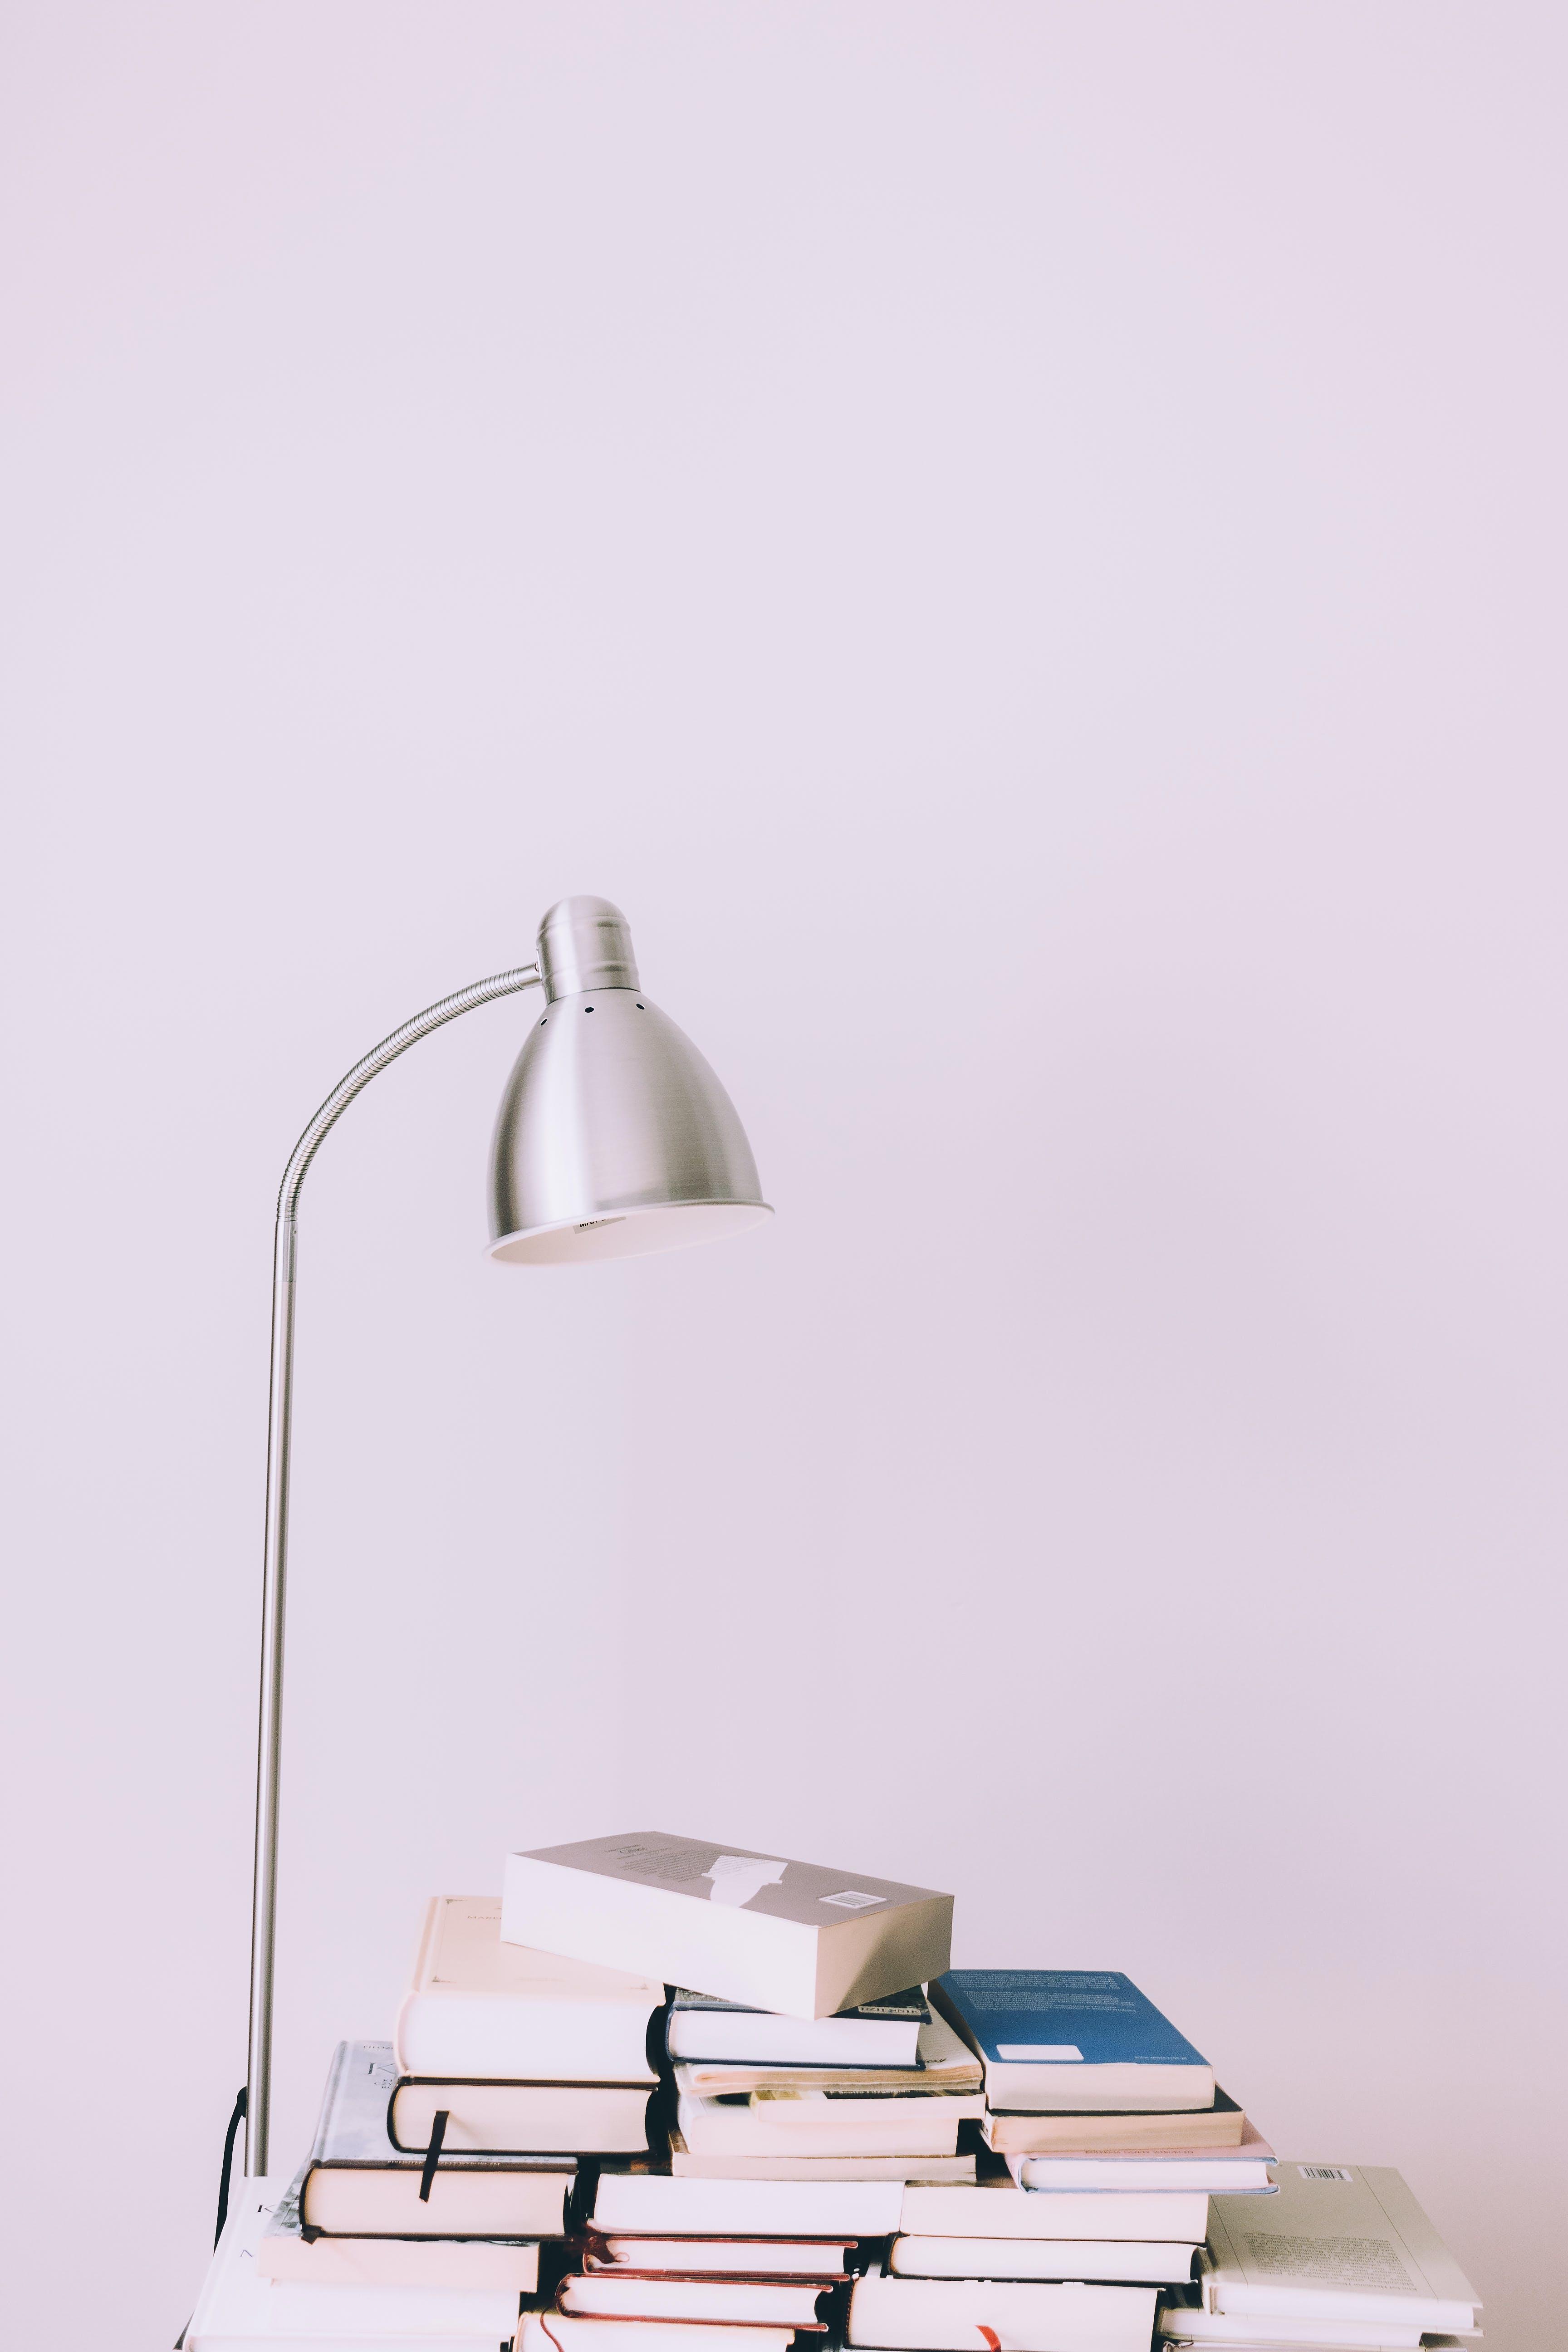 Silver Desk Lamp Near Pile of Books